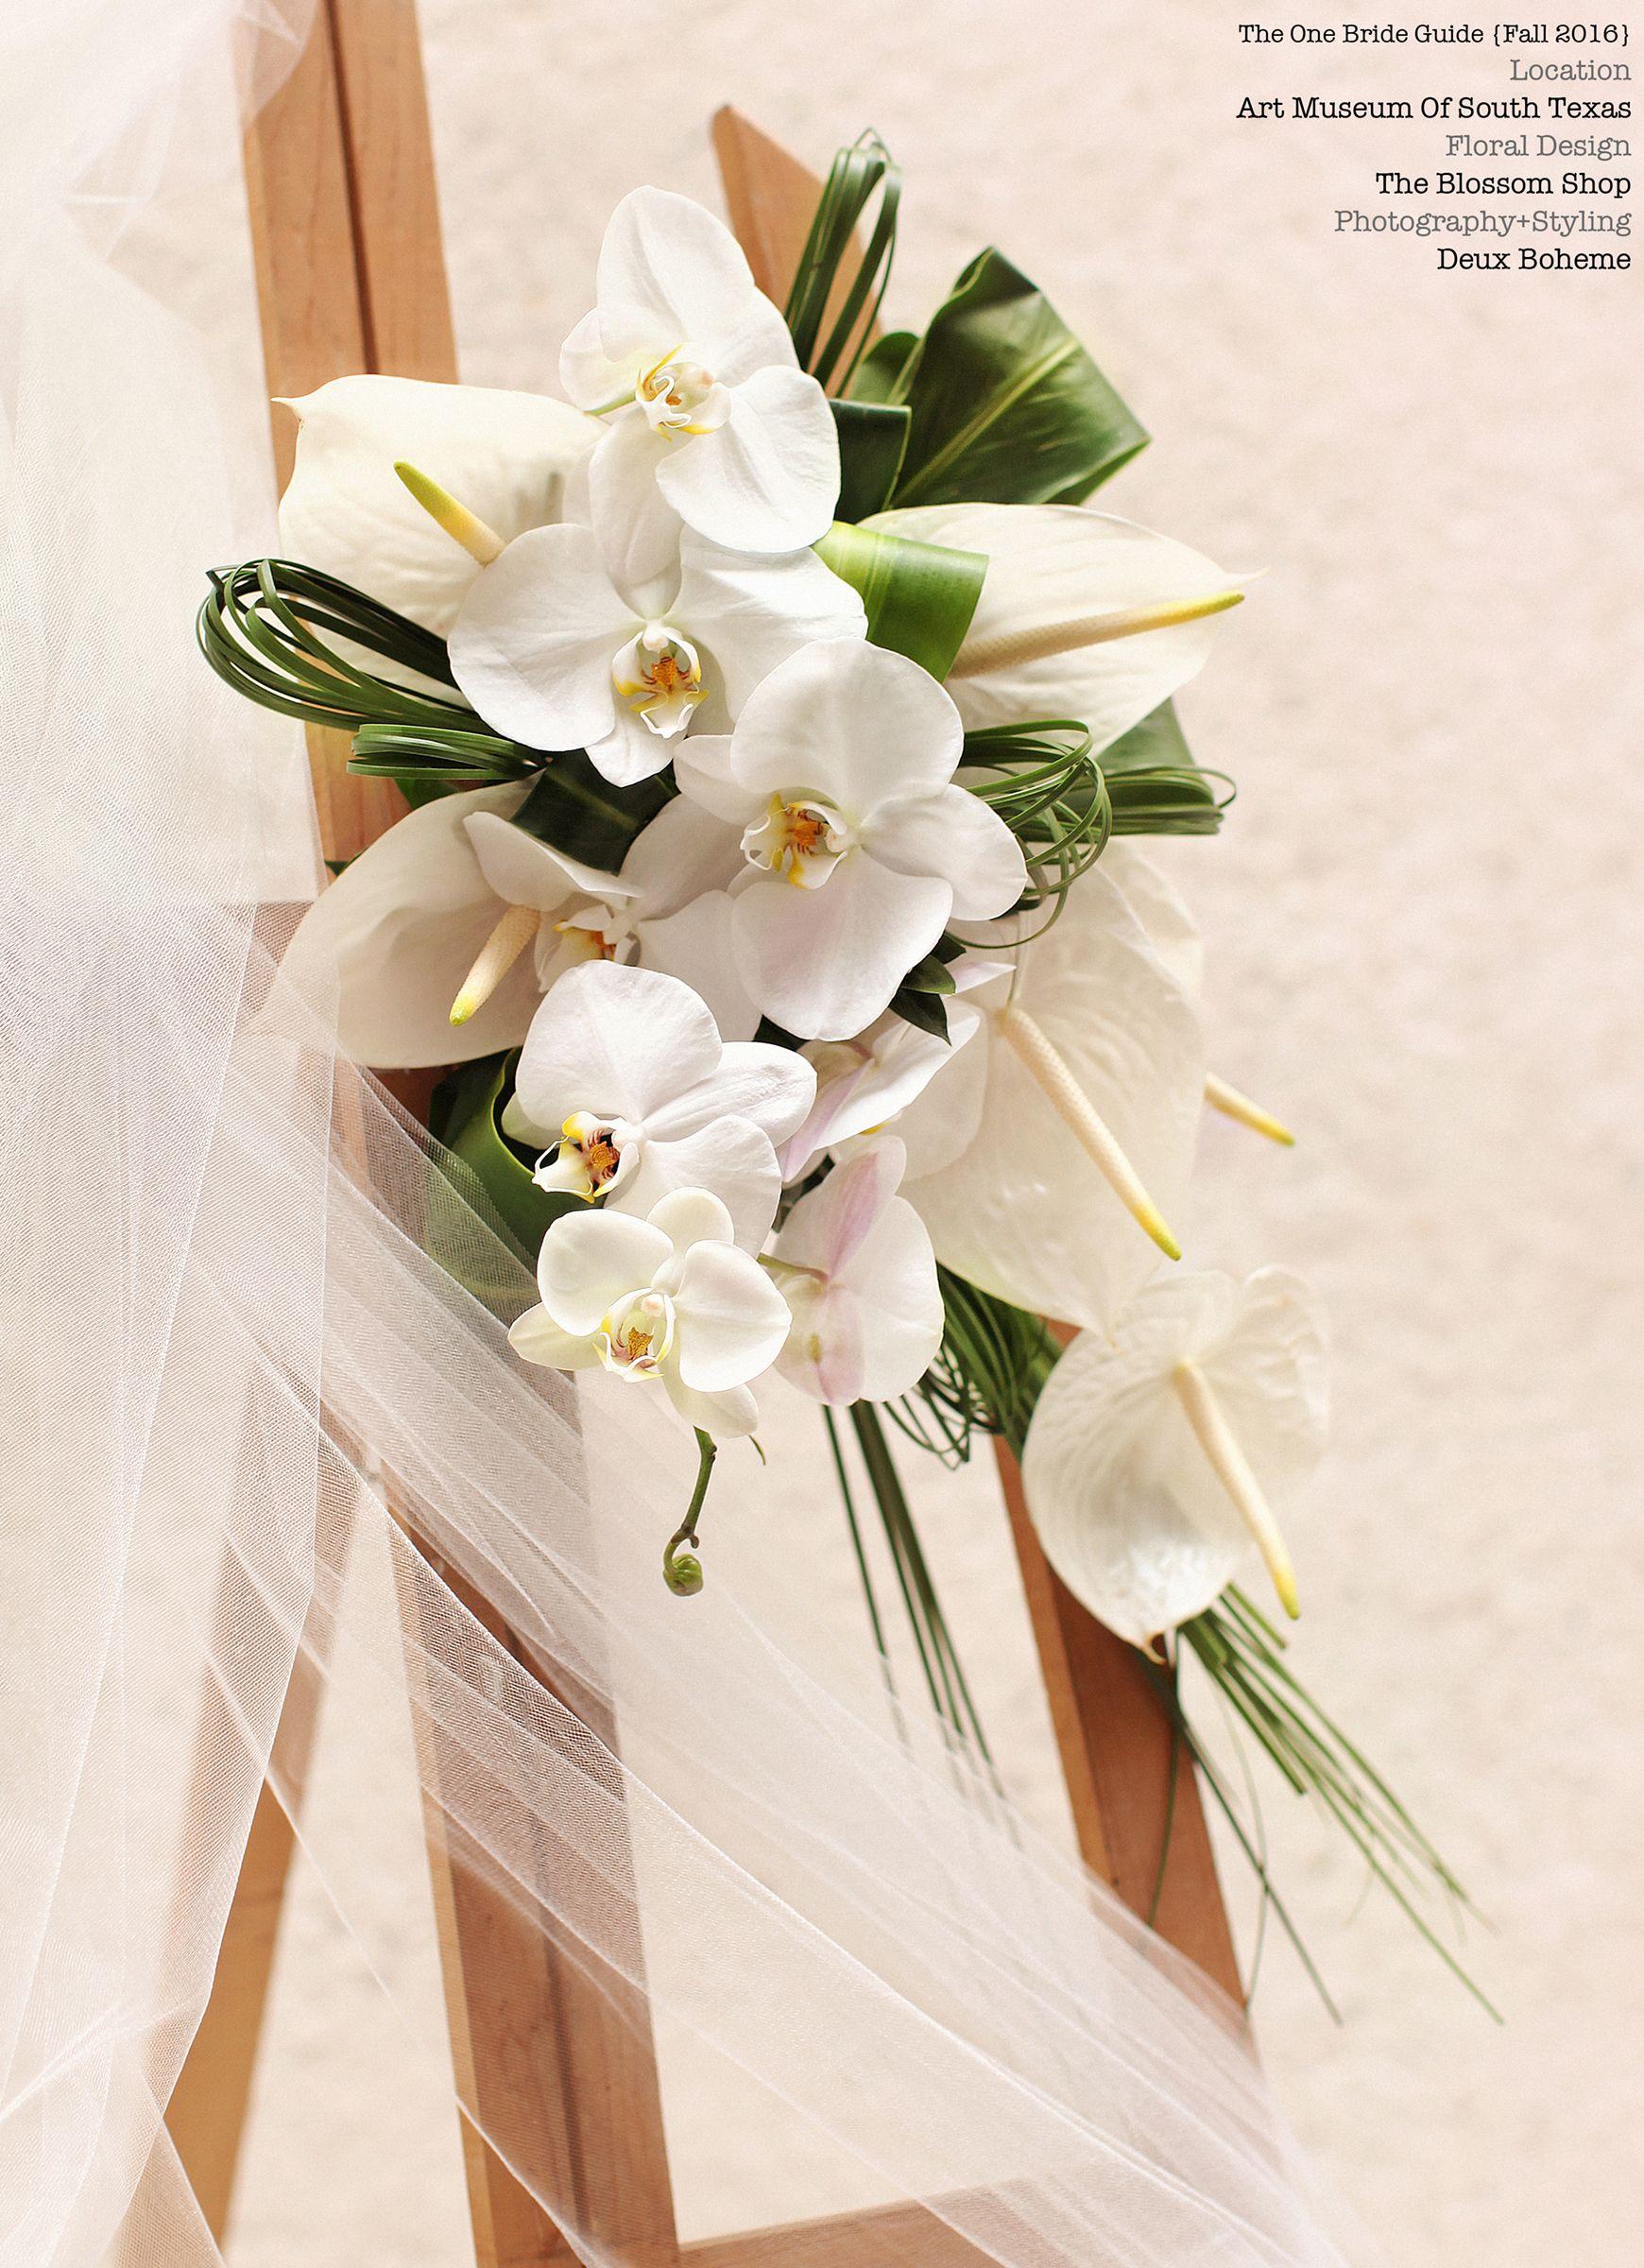 Avant Garde bouquet. Contemporary floral design, artistic bridal, minimalist wedding inspiration. Modern art bride. Photography by www.deuxboheme.com